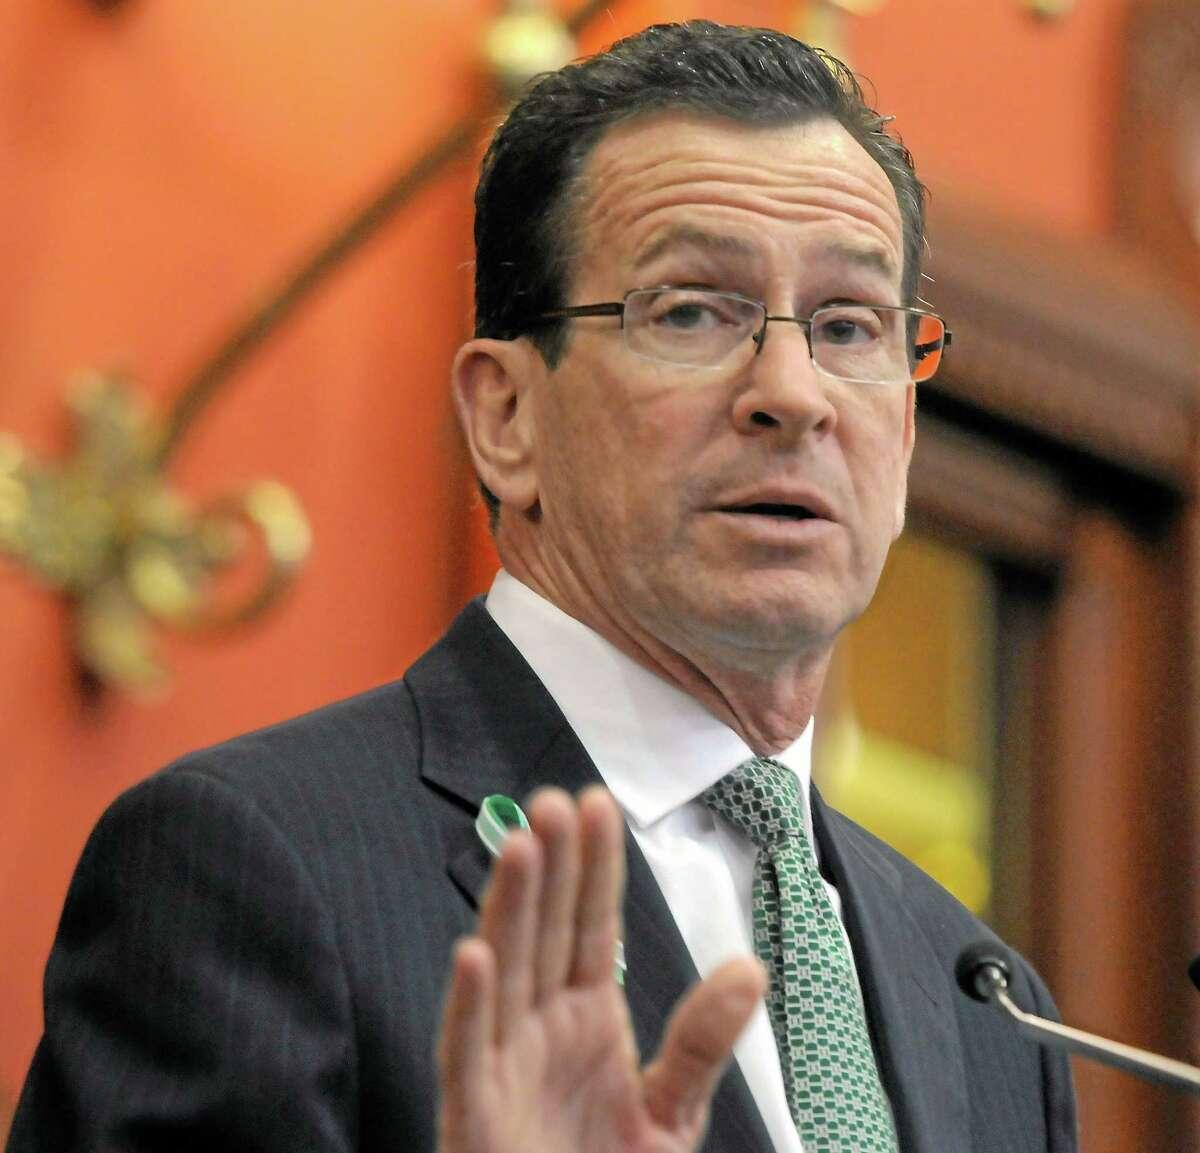 Gov. Dannel P. Malloy addresses the Connecticut legislature in this 2013 file photo.